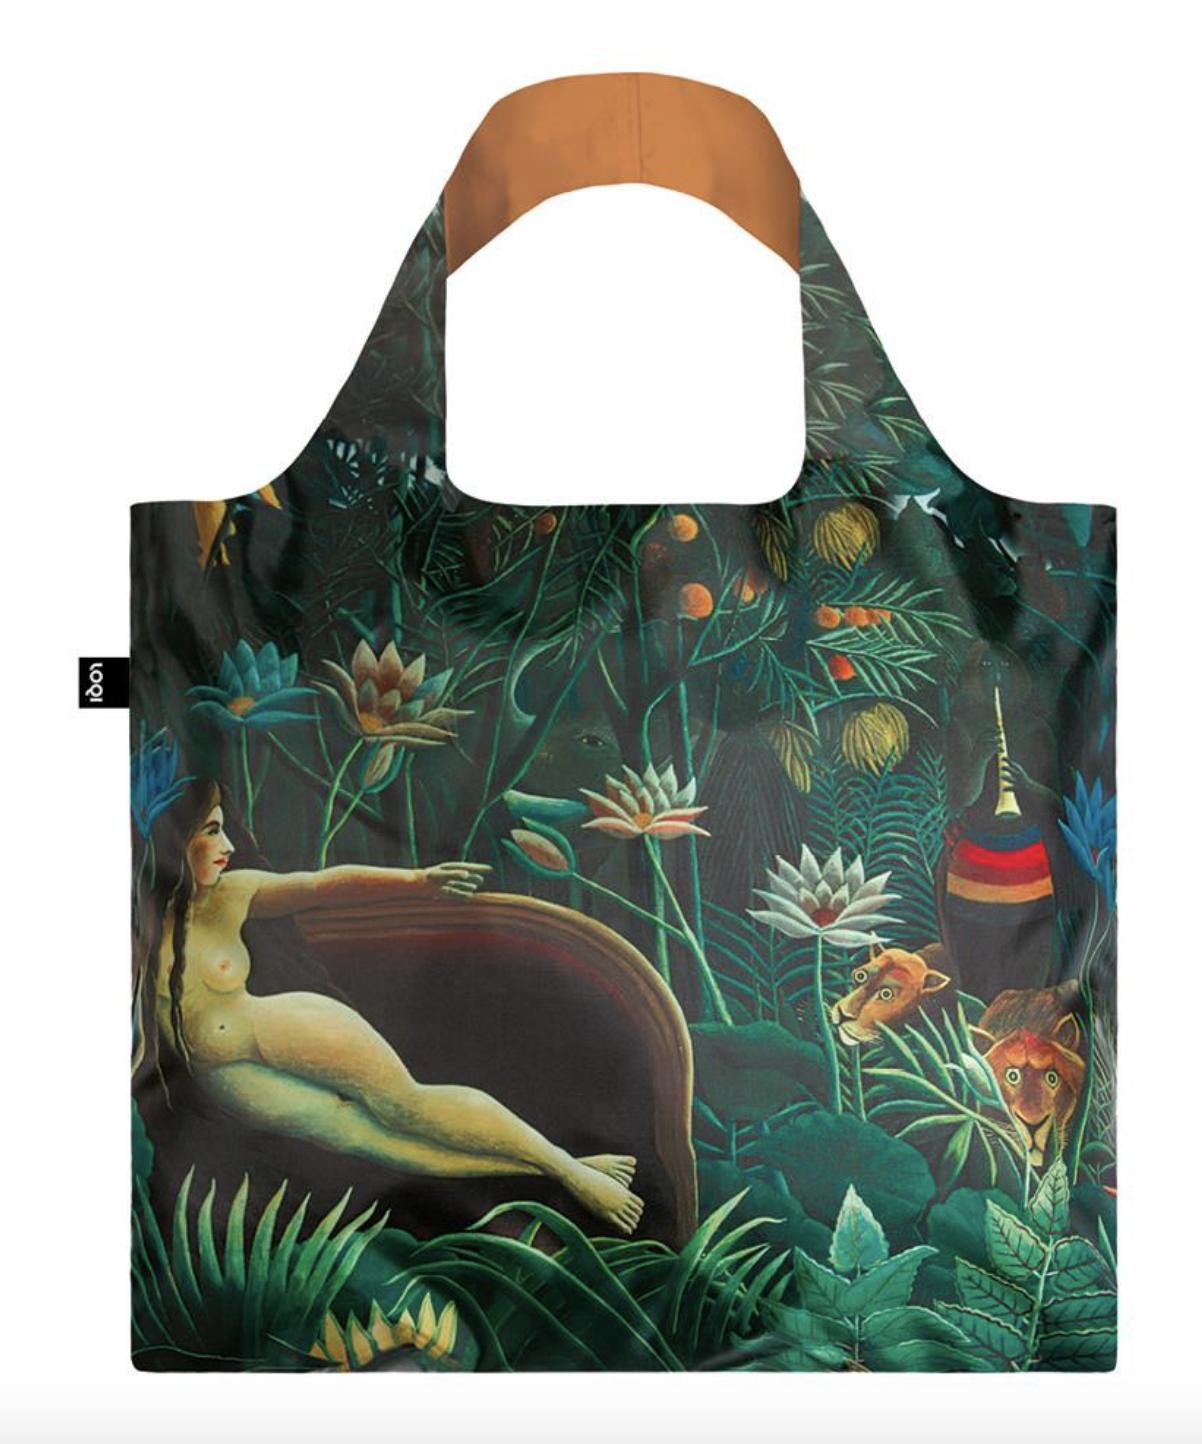 Sam Flax Orlando LOQI Dream Bag